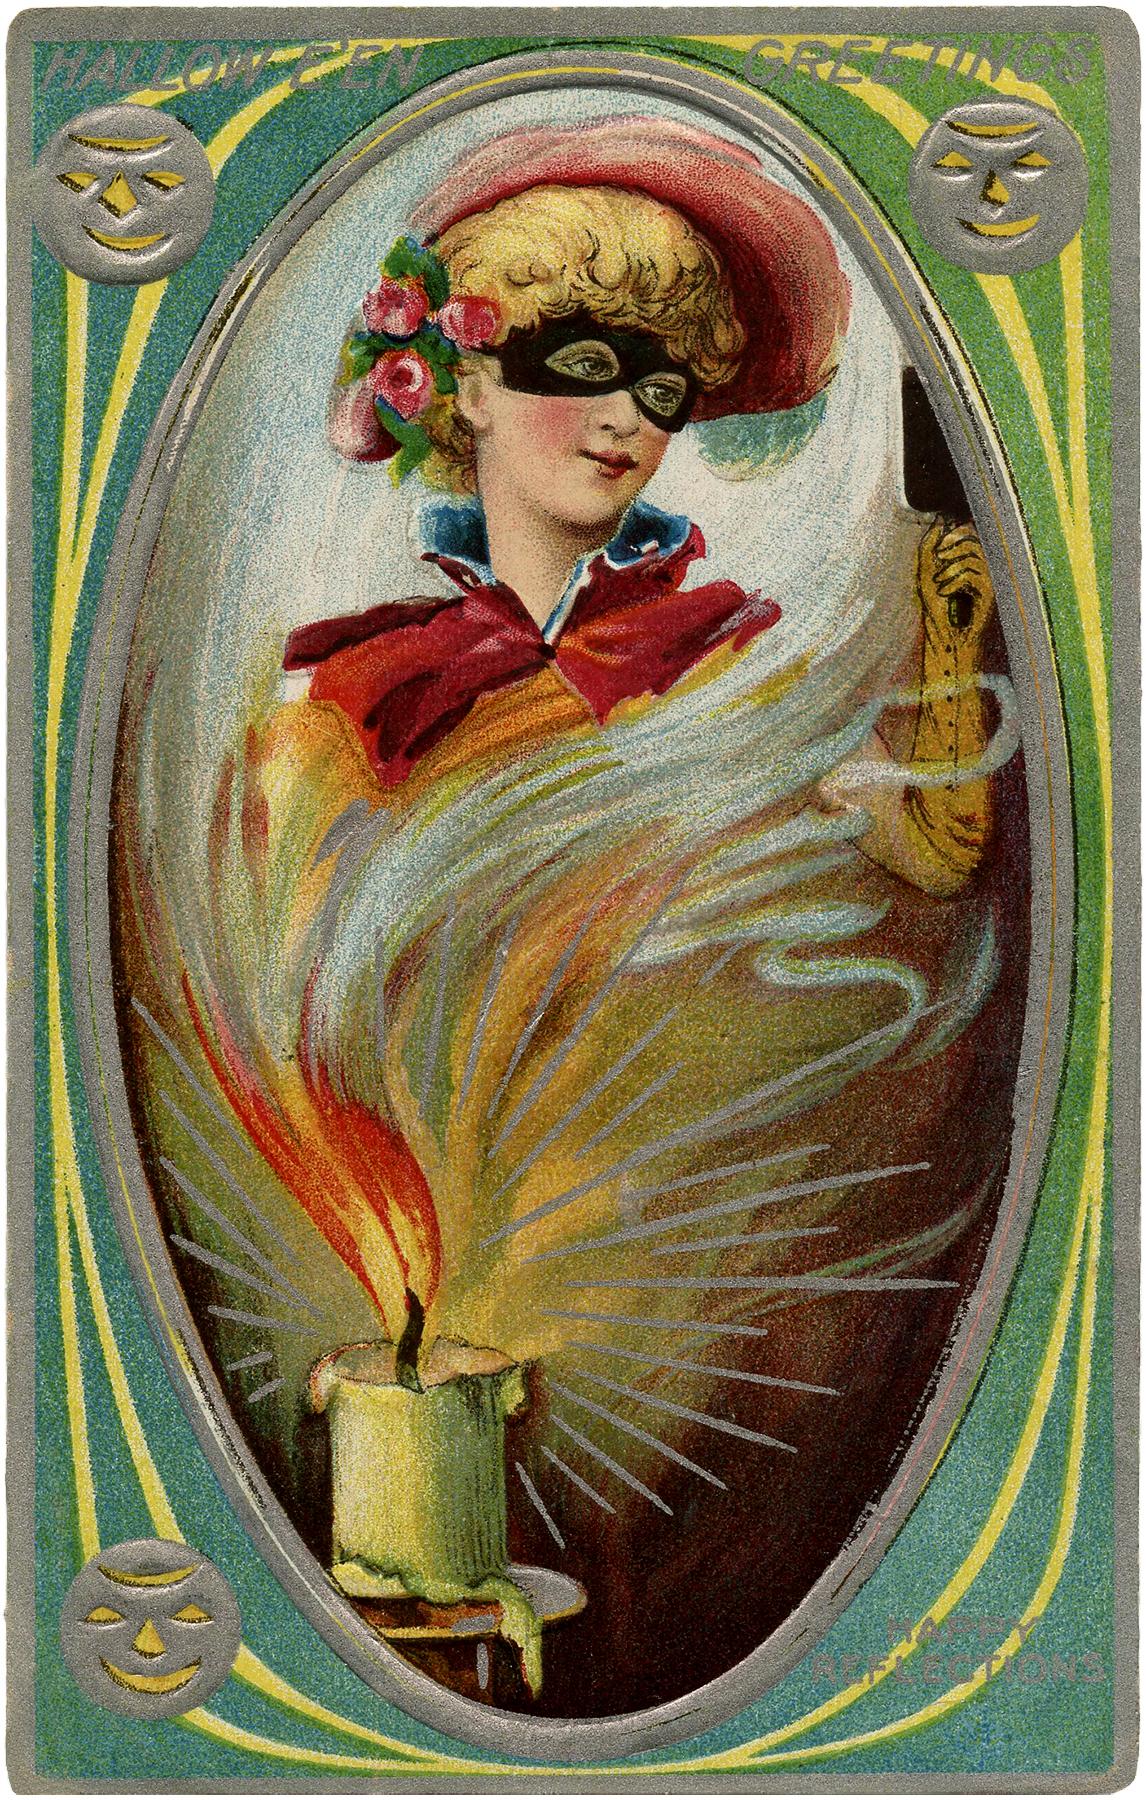 Halloween Mystery Lady Image